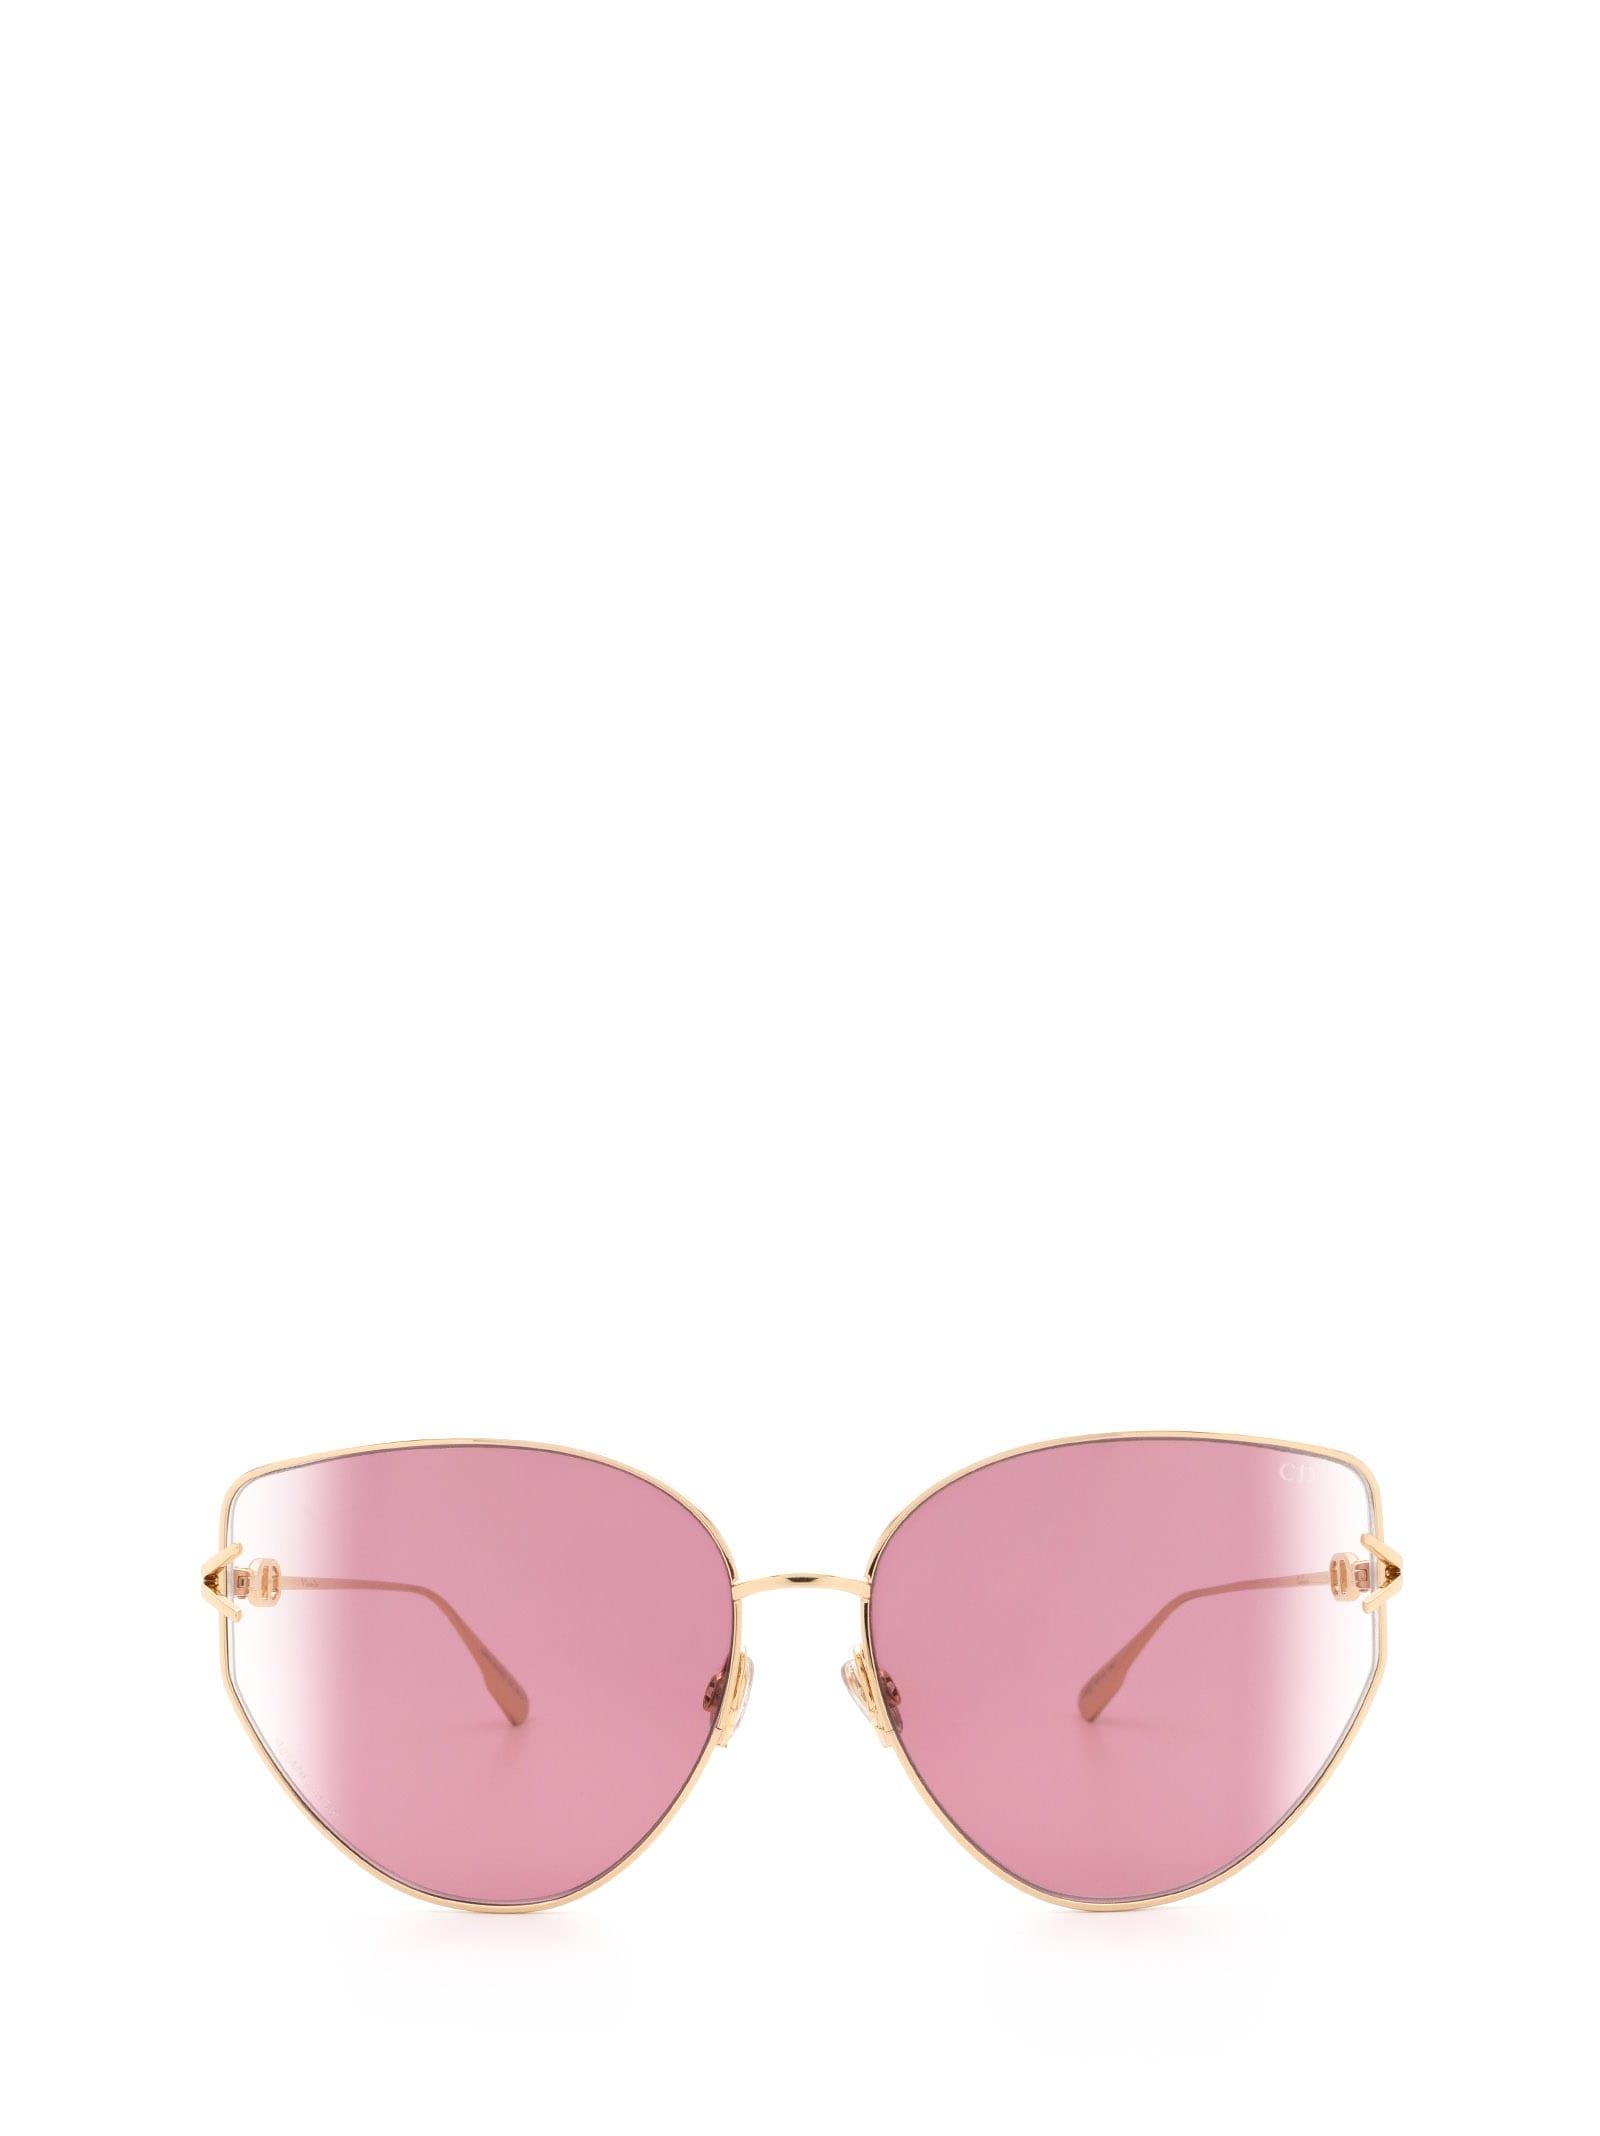 Dior GIPSY1 ROSE GOLD SUNGLASSES